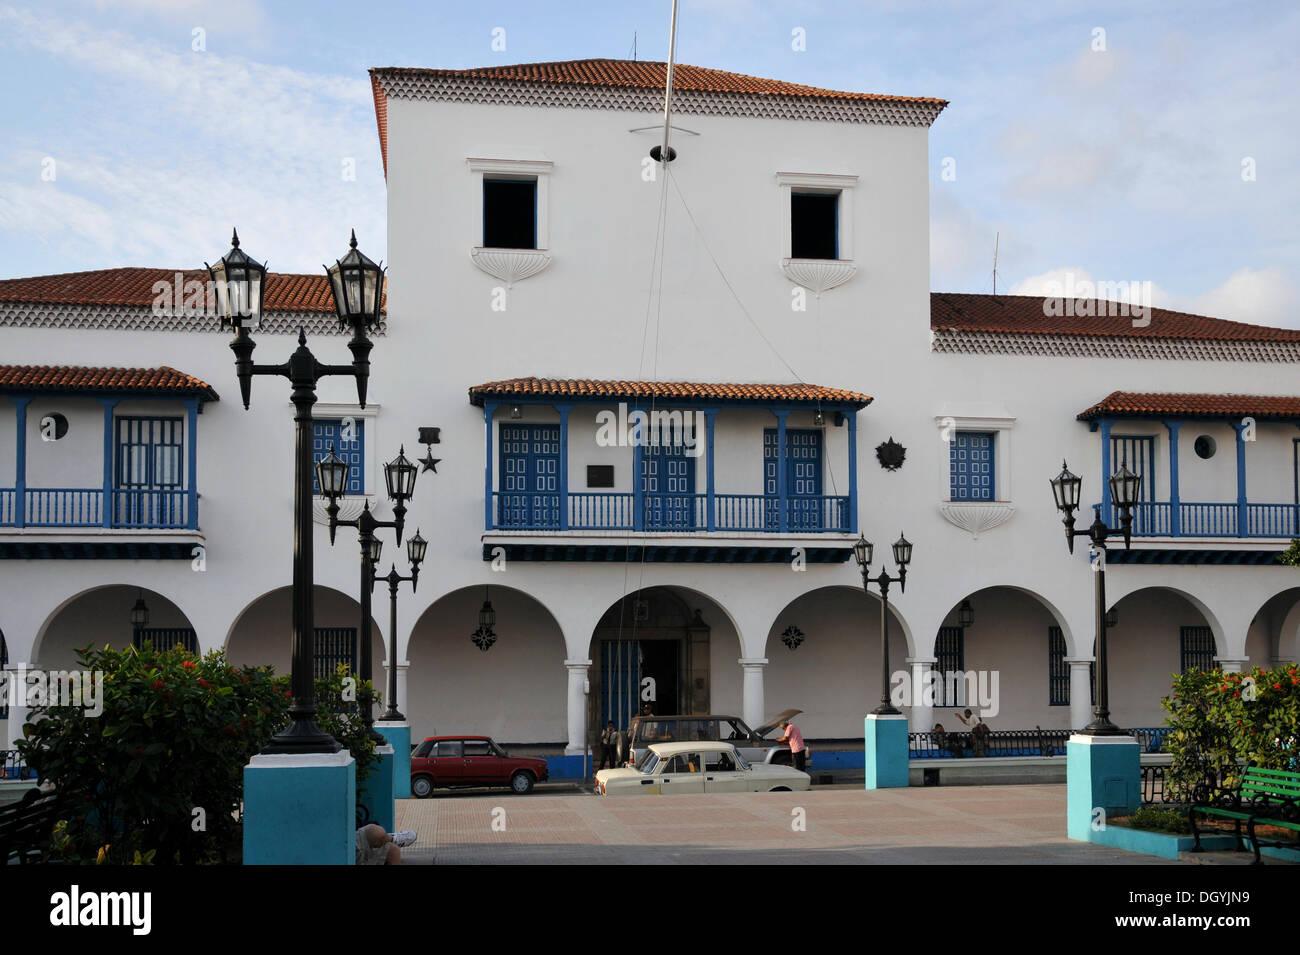 Fidel Castro Balkon, Rathaus, Parque Cespedes, Altstadt, Santiago de Cuba, Kuba, Karibik, Zentralamerika Stockbild